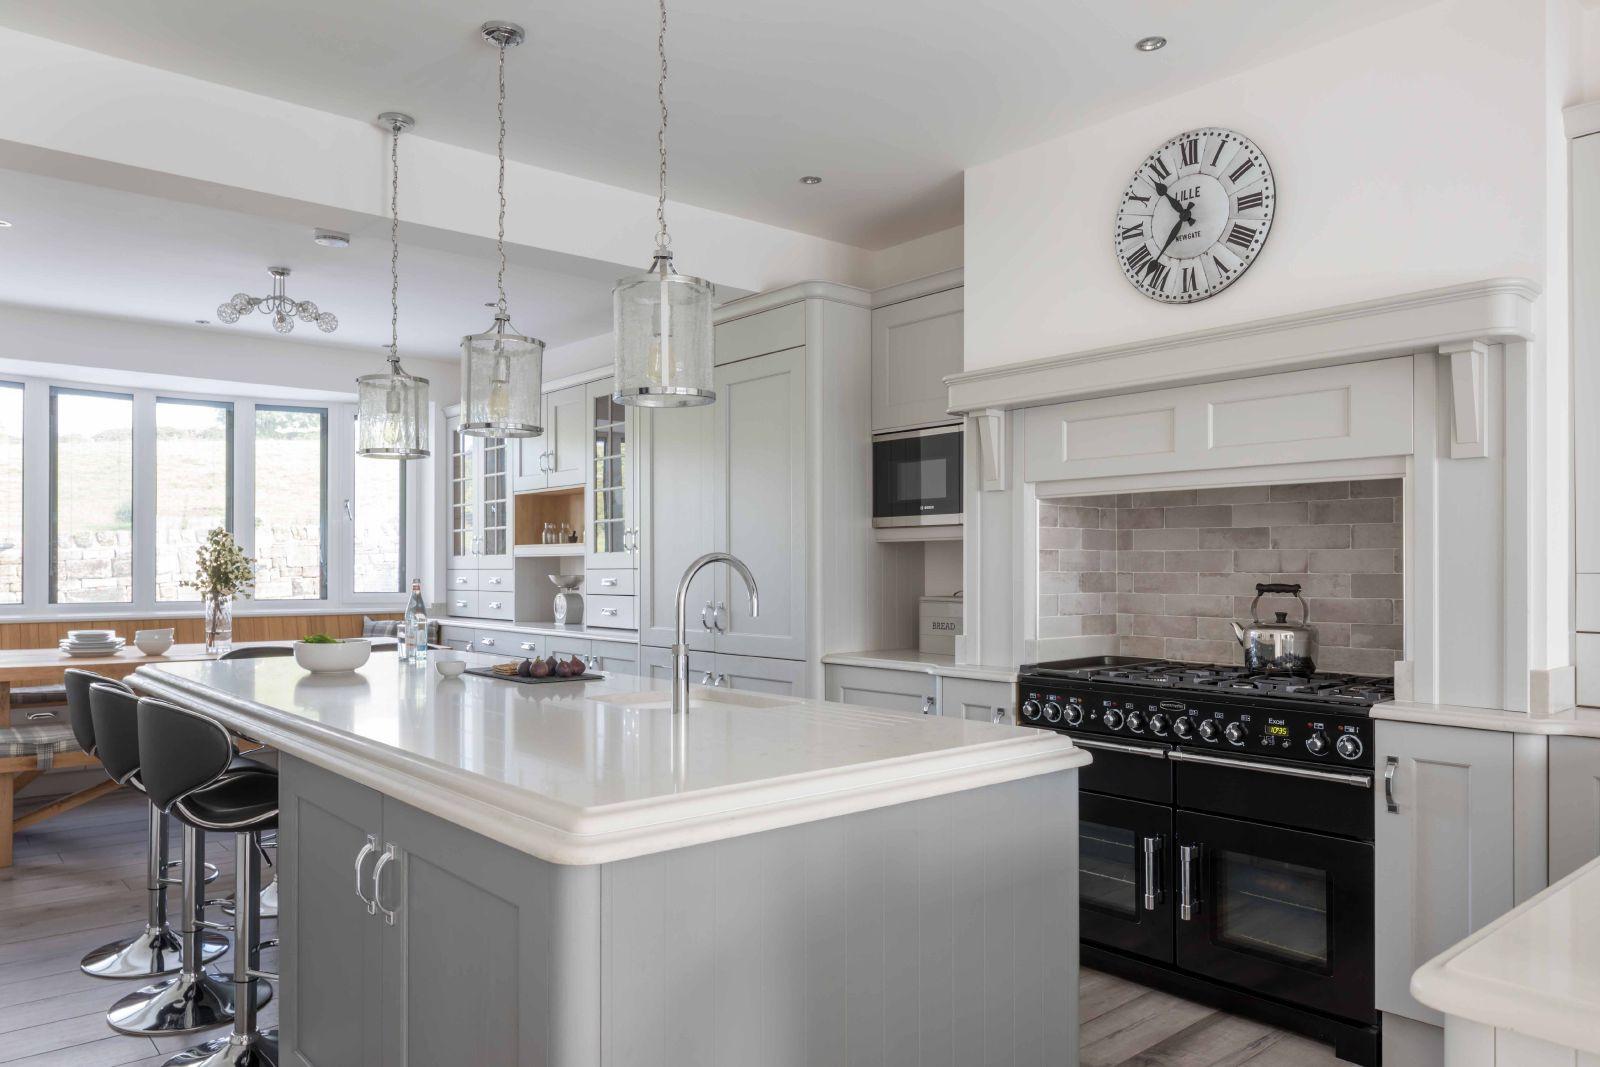 Masterclass-Kitchens-Grey-Shaker-Kitchen